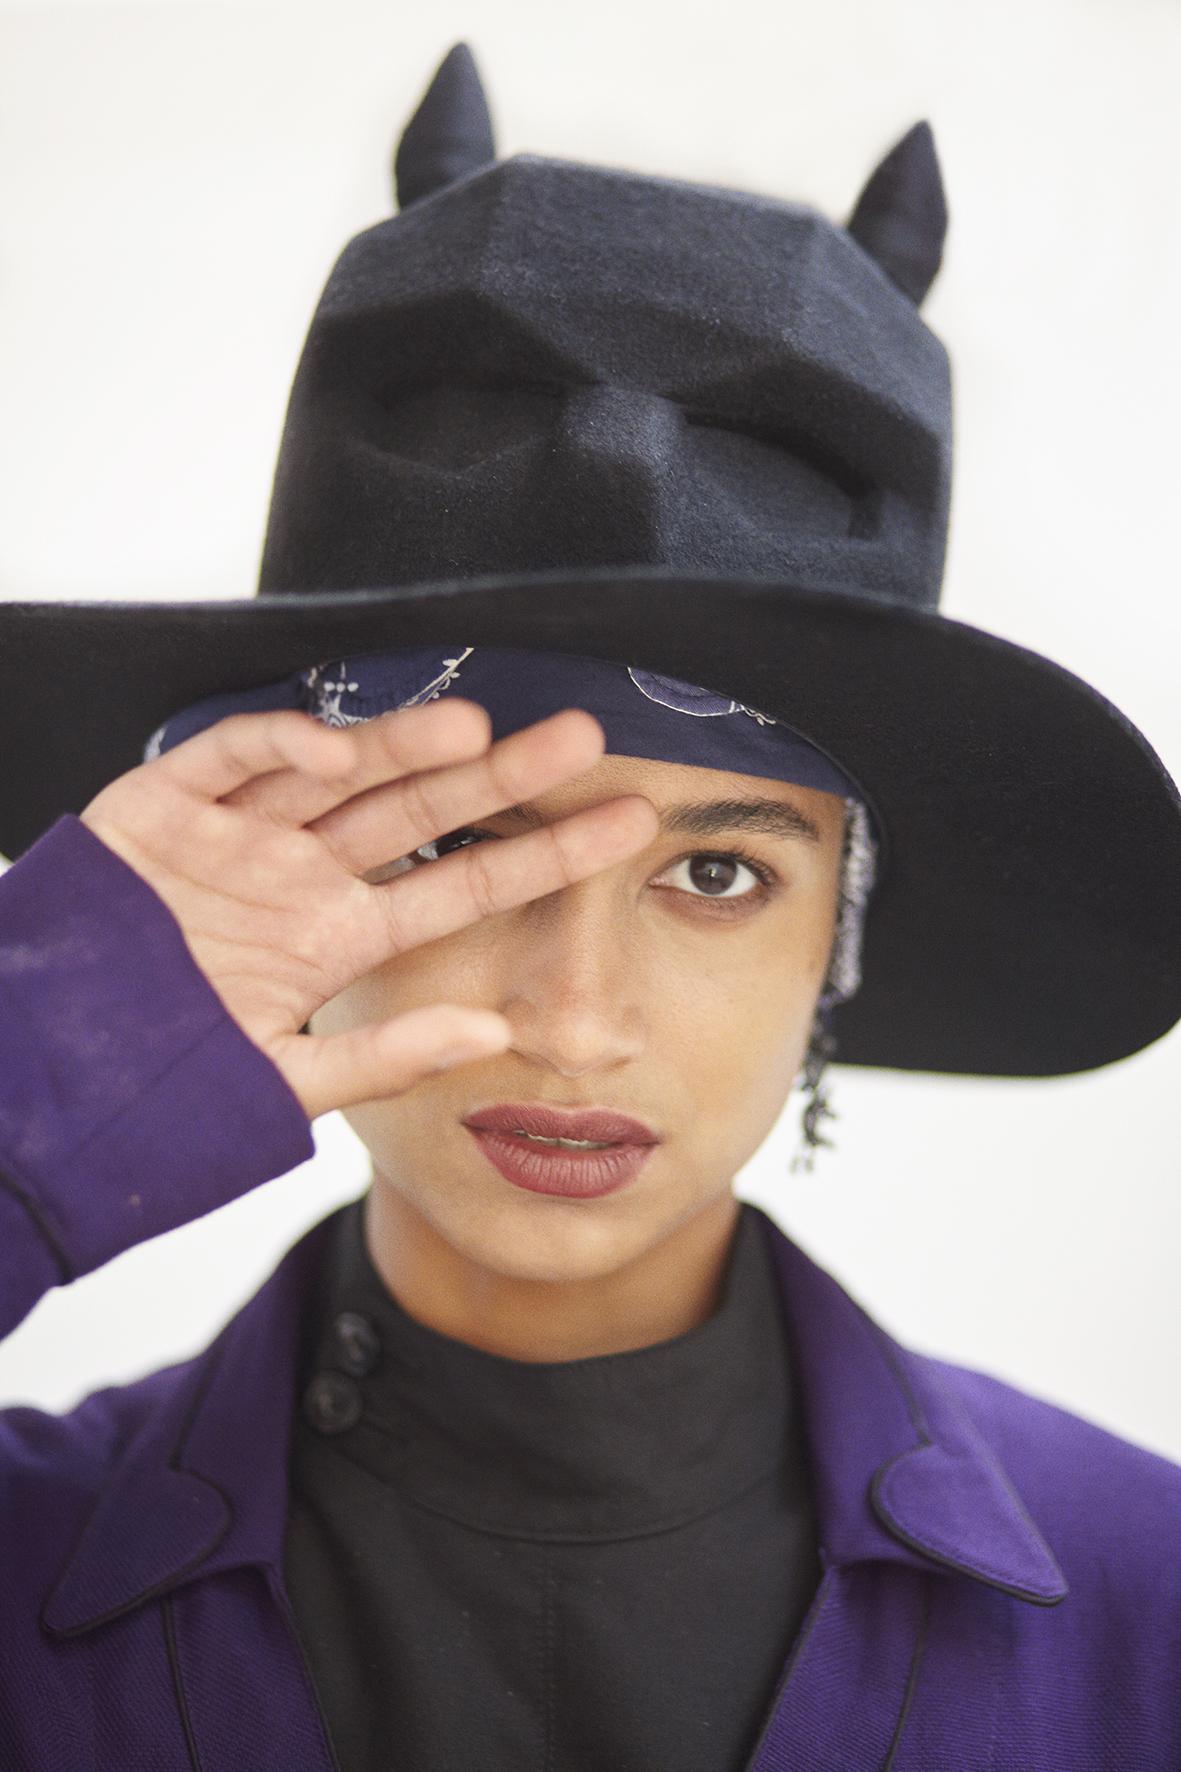 Felt wool skull hat, mask bandana, cotton jacket, croise fencing jacket in black. Long drop earrings EDDIE BORGO